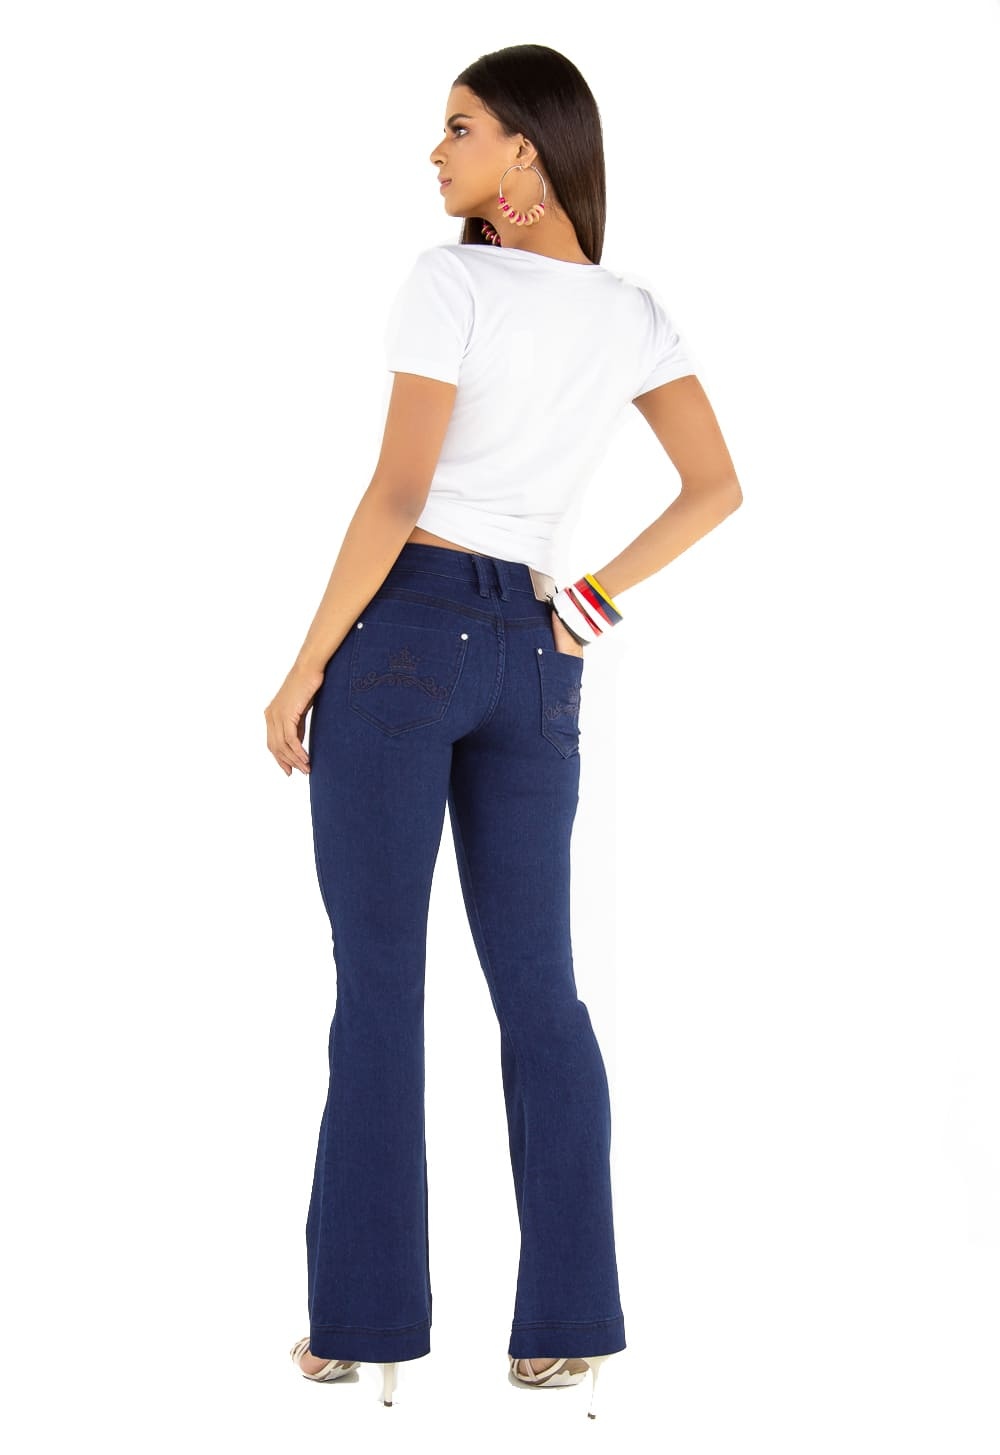 Calça Flare Feminina Tradicional Jeans